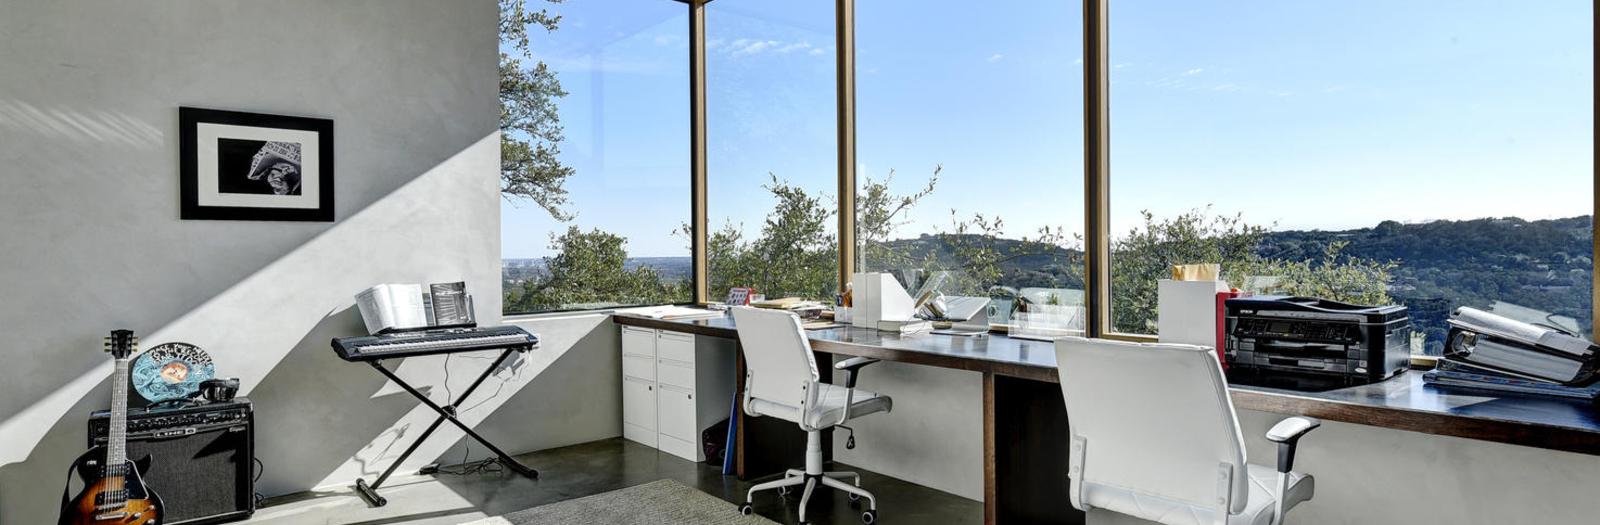 Ideas for home design decorating and remodeling designmine for Home turf texas landscape design llc